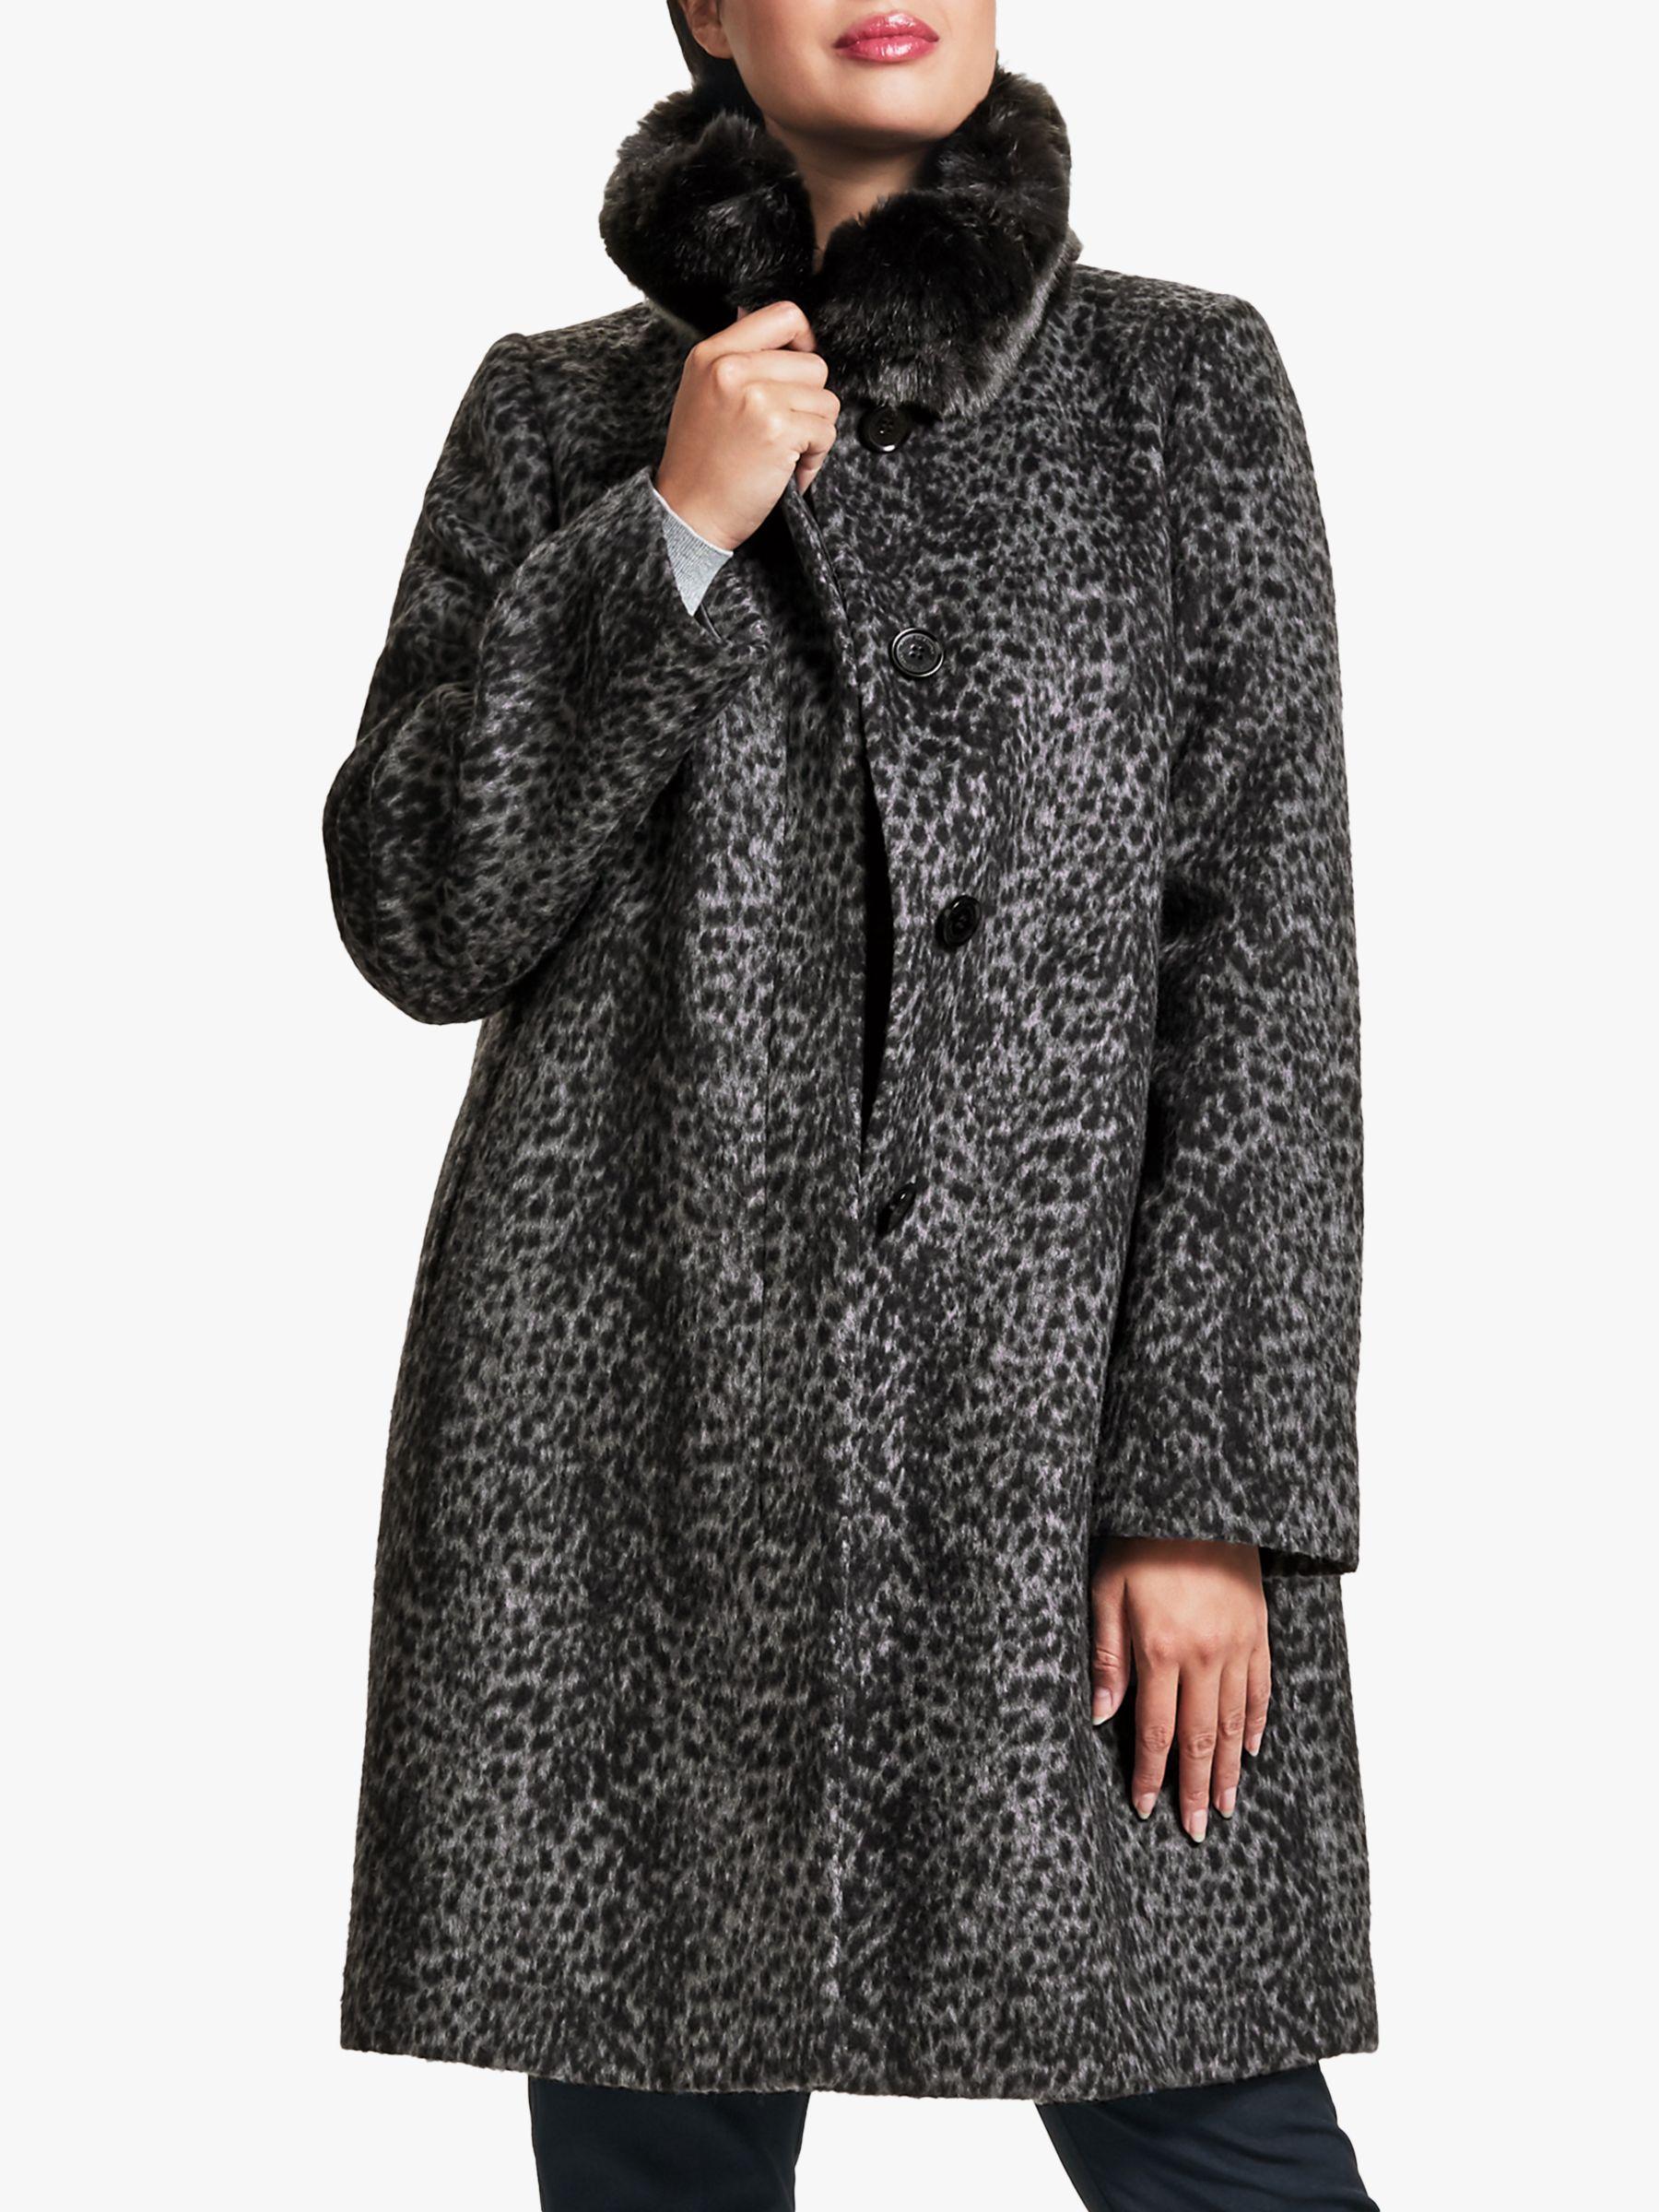 Four Seasons Four Seasons Petite Faux Fur Animal Print Coat, Grey